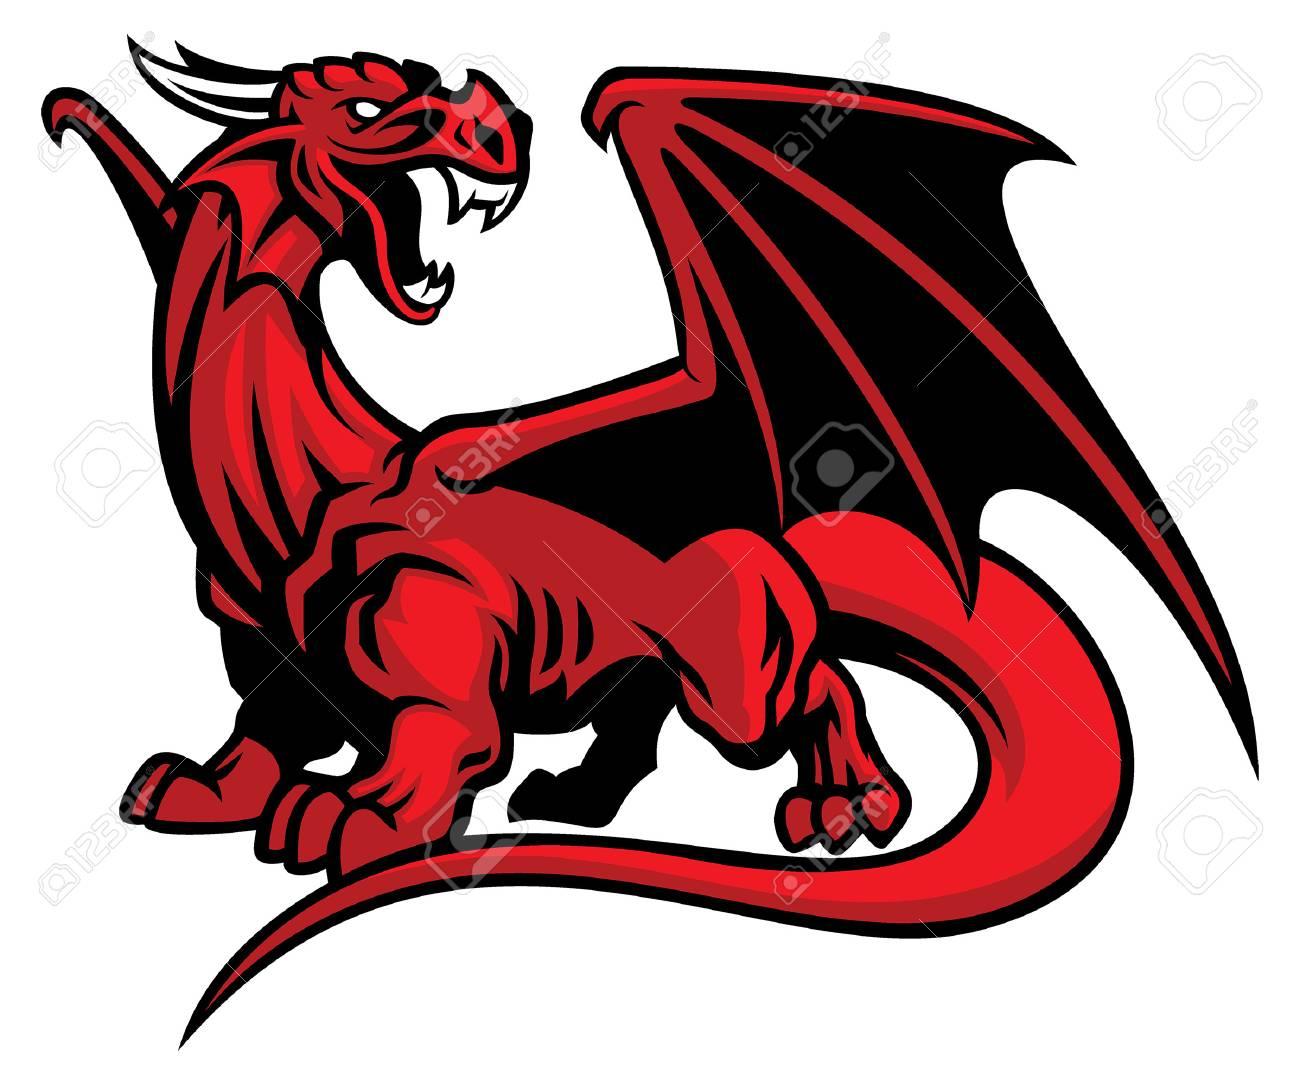 dragon mascot - 120704030